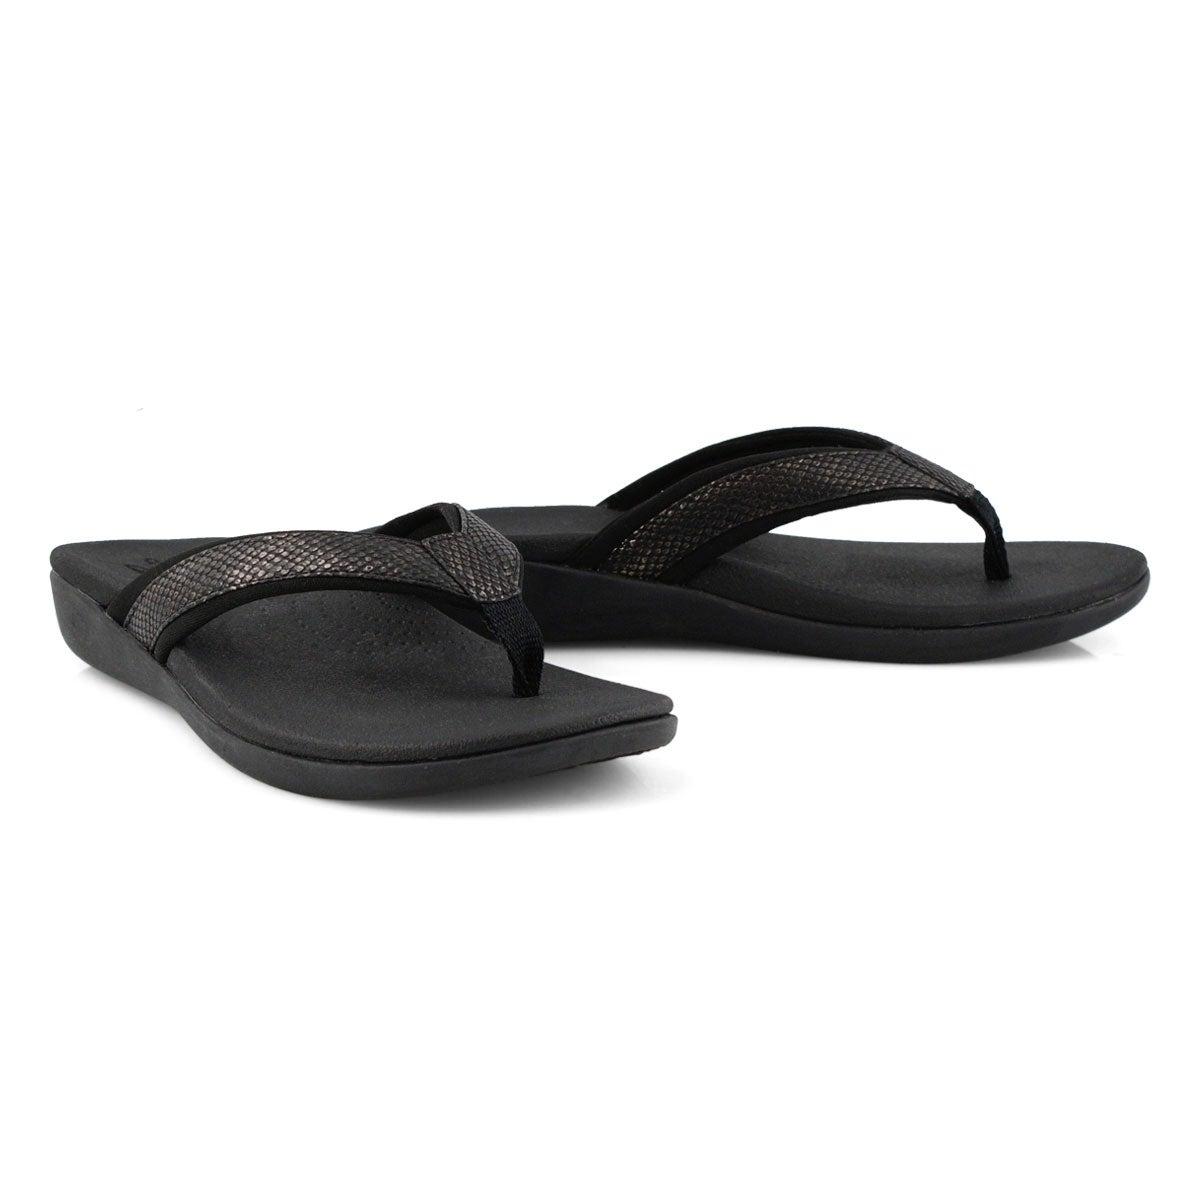 Lds Brio Sol black snake casual sandal